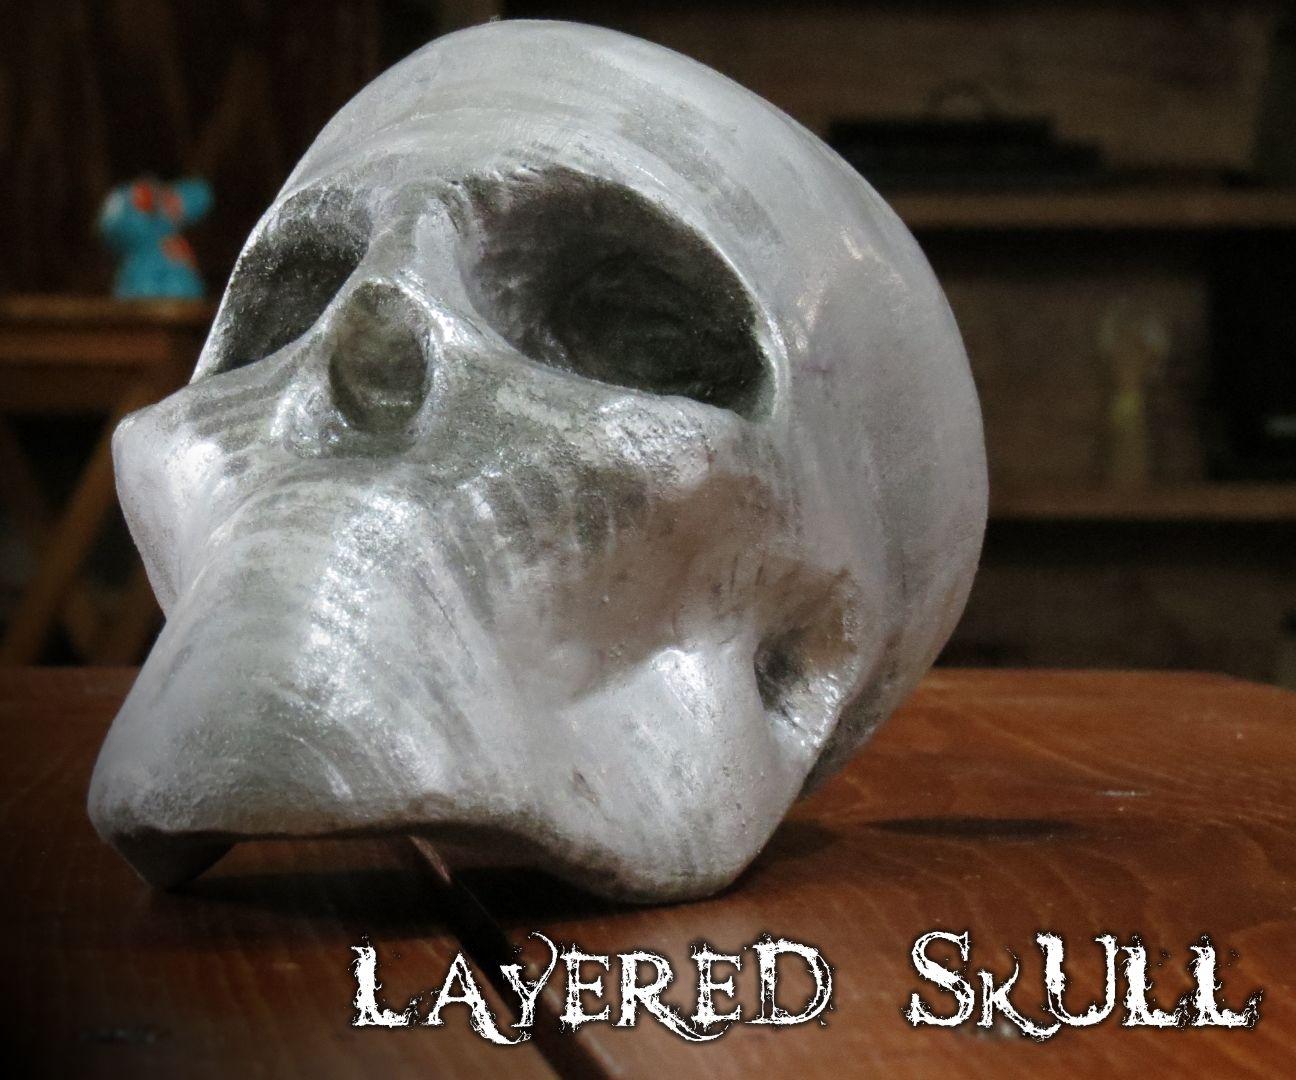 Making an MDF Layered Skull Using 123D Make